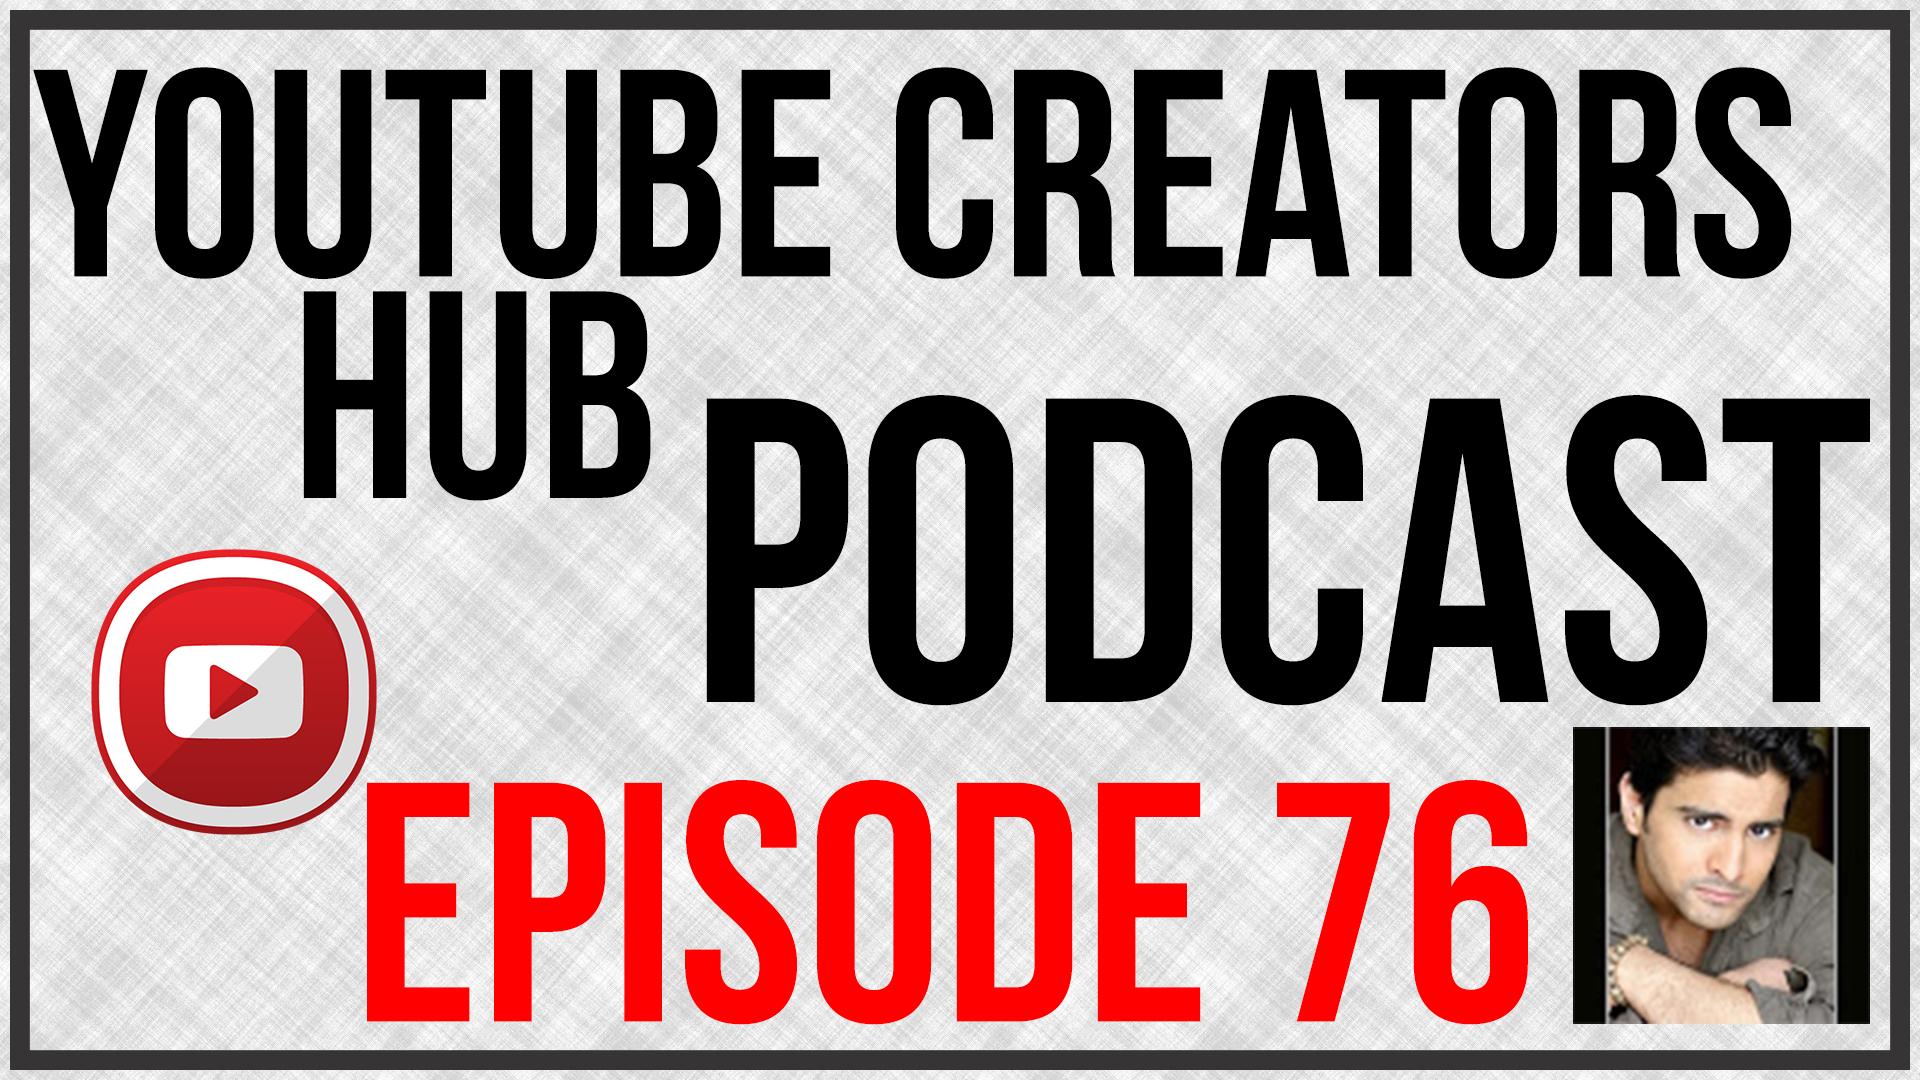 YouTube Creators Hub Podcast Episode 76